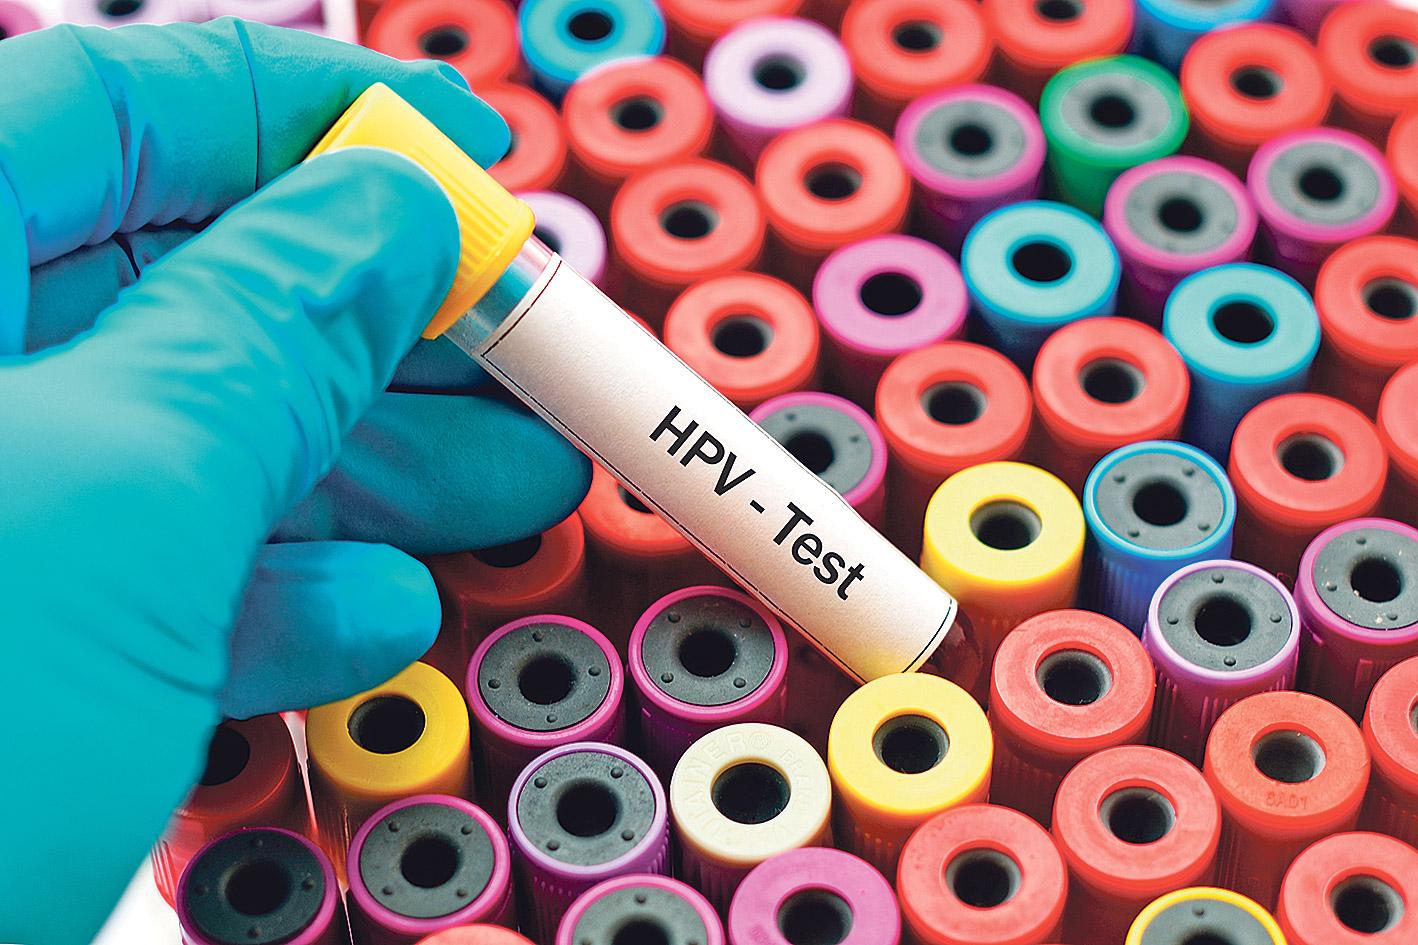 parazita tablettákat tanácsolni